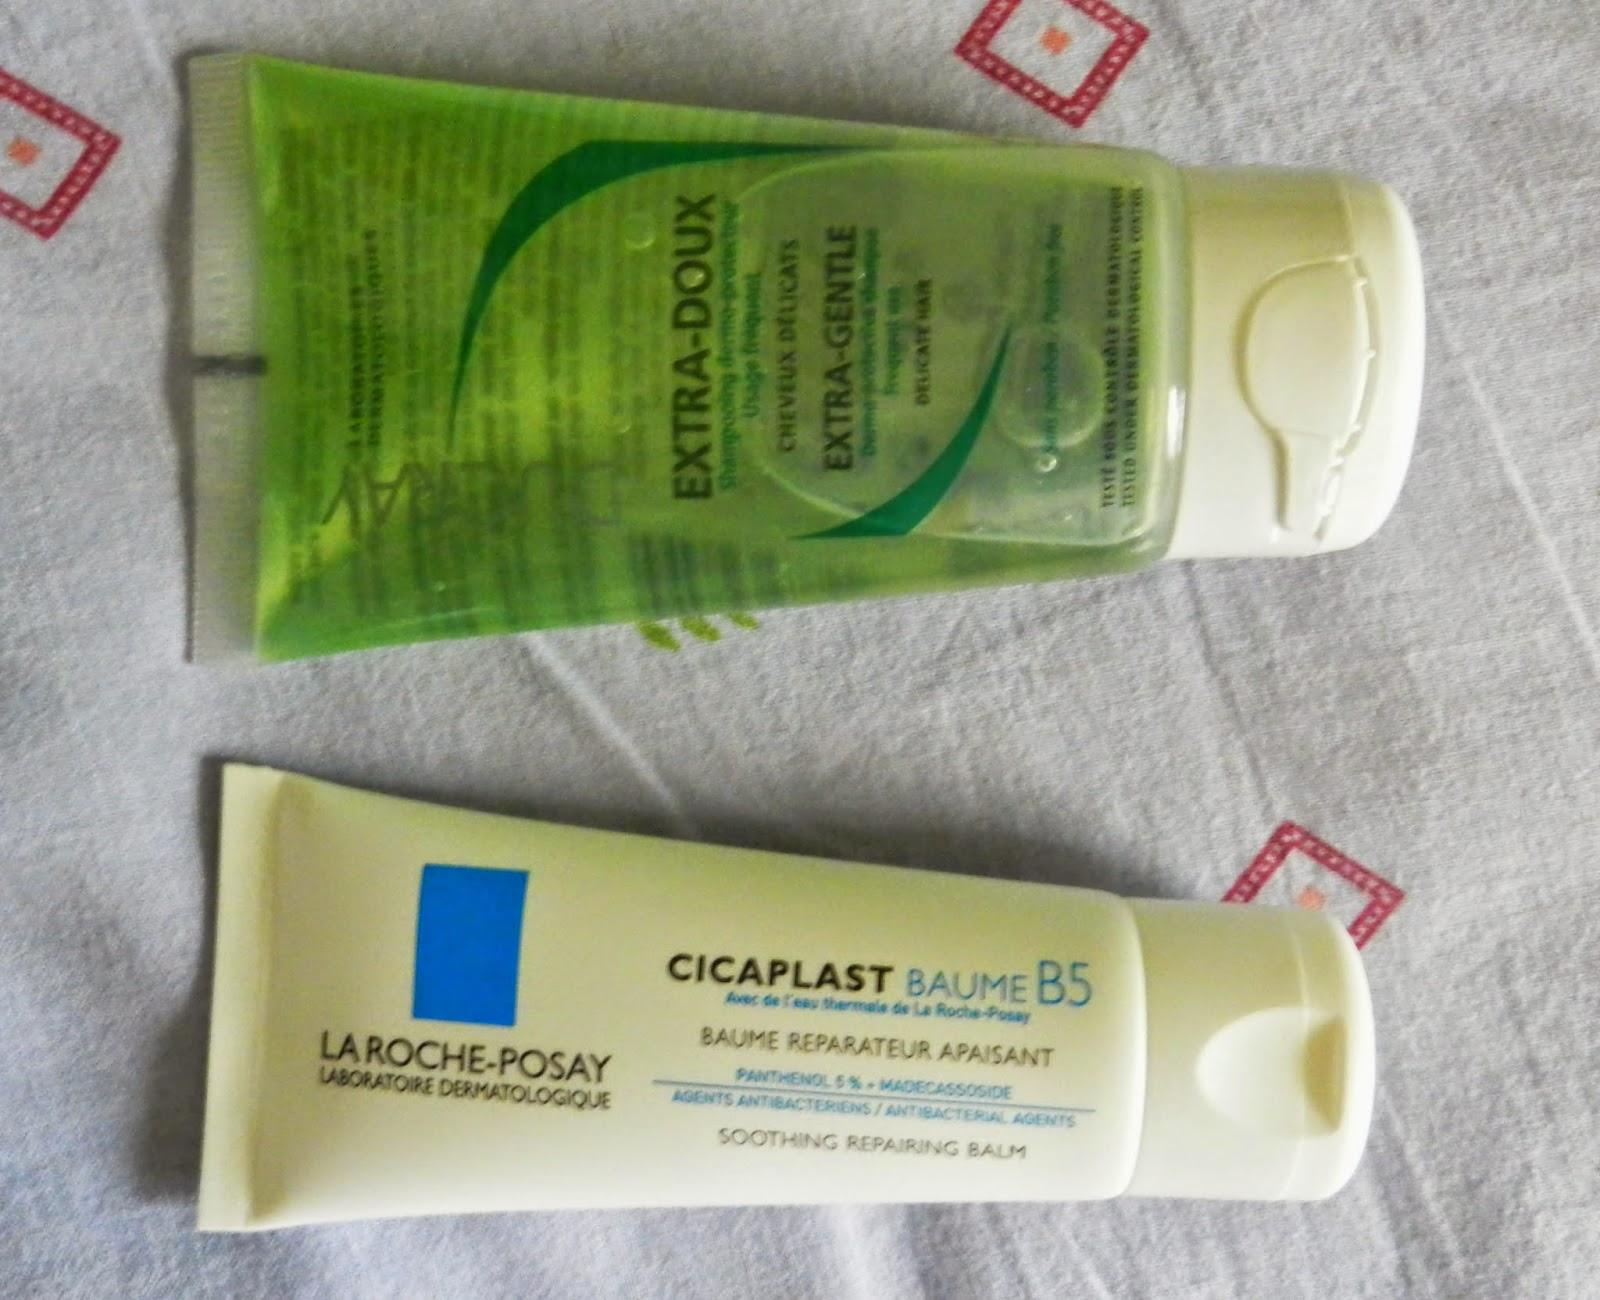 Ducray Extra-Gentle Shampoo, La Roche Posay Cicaplast Baume B5